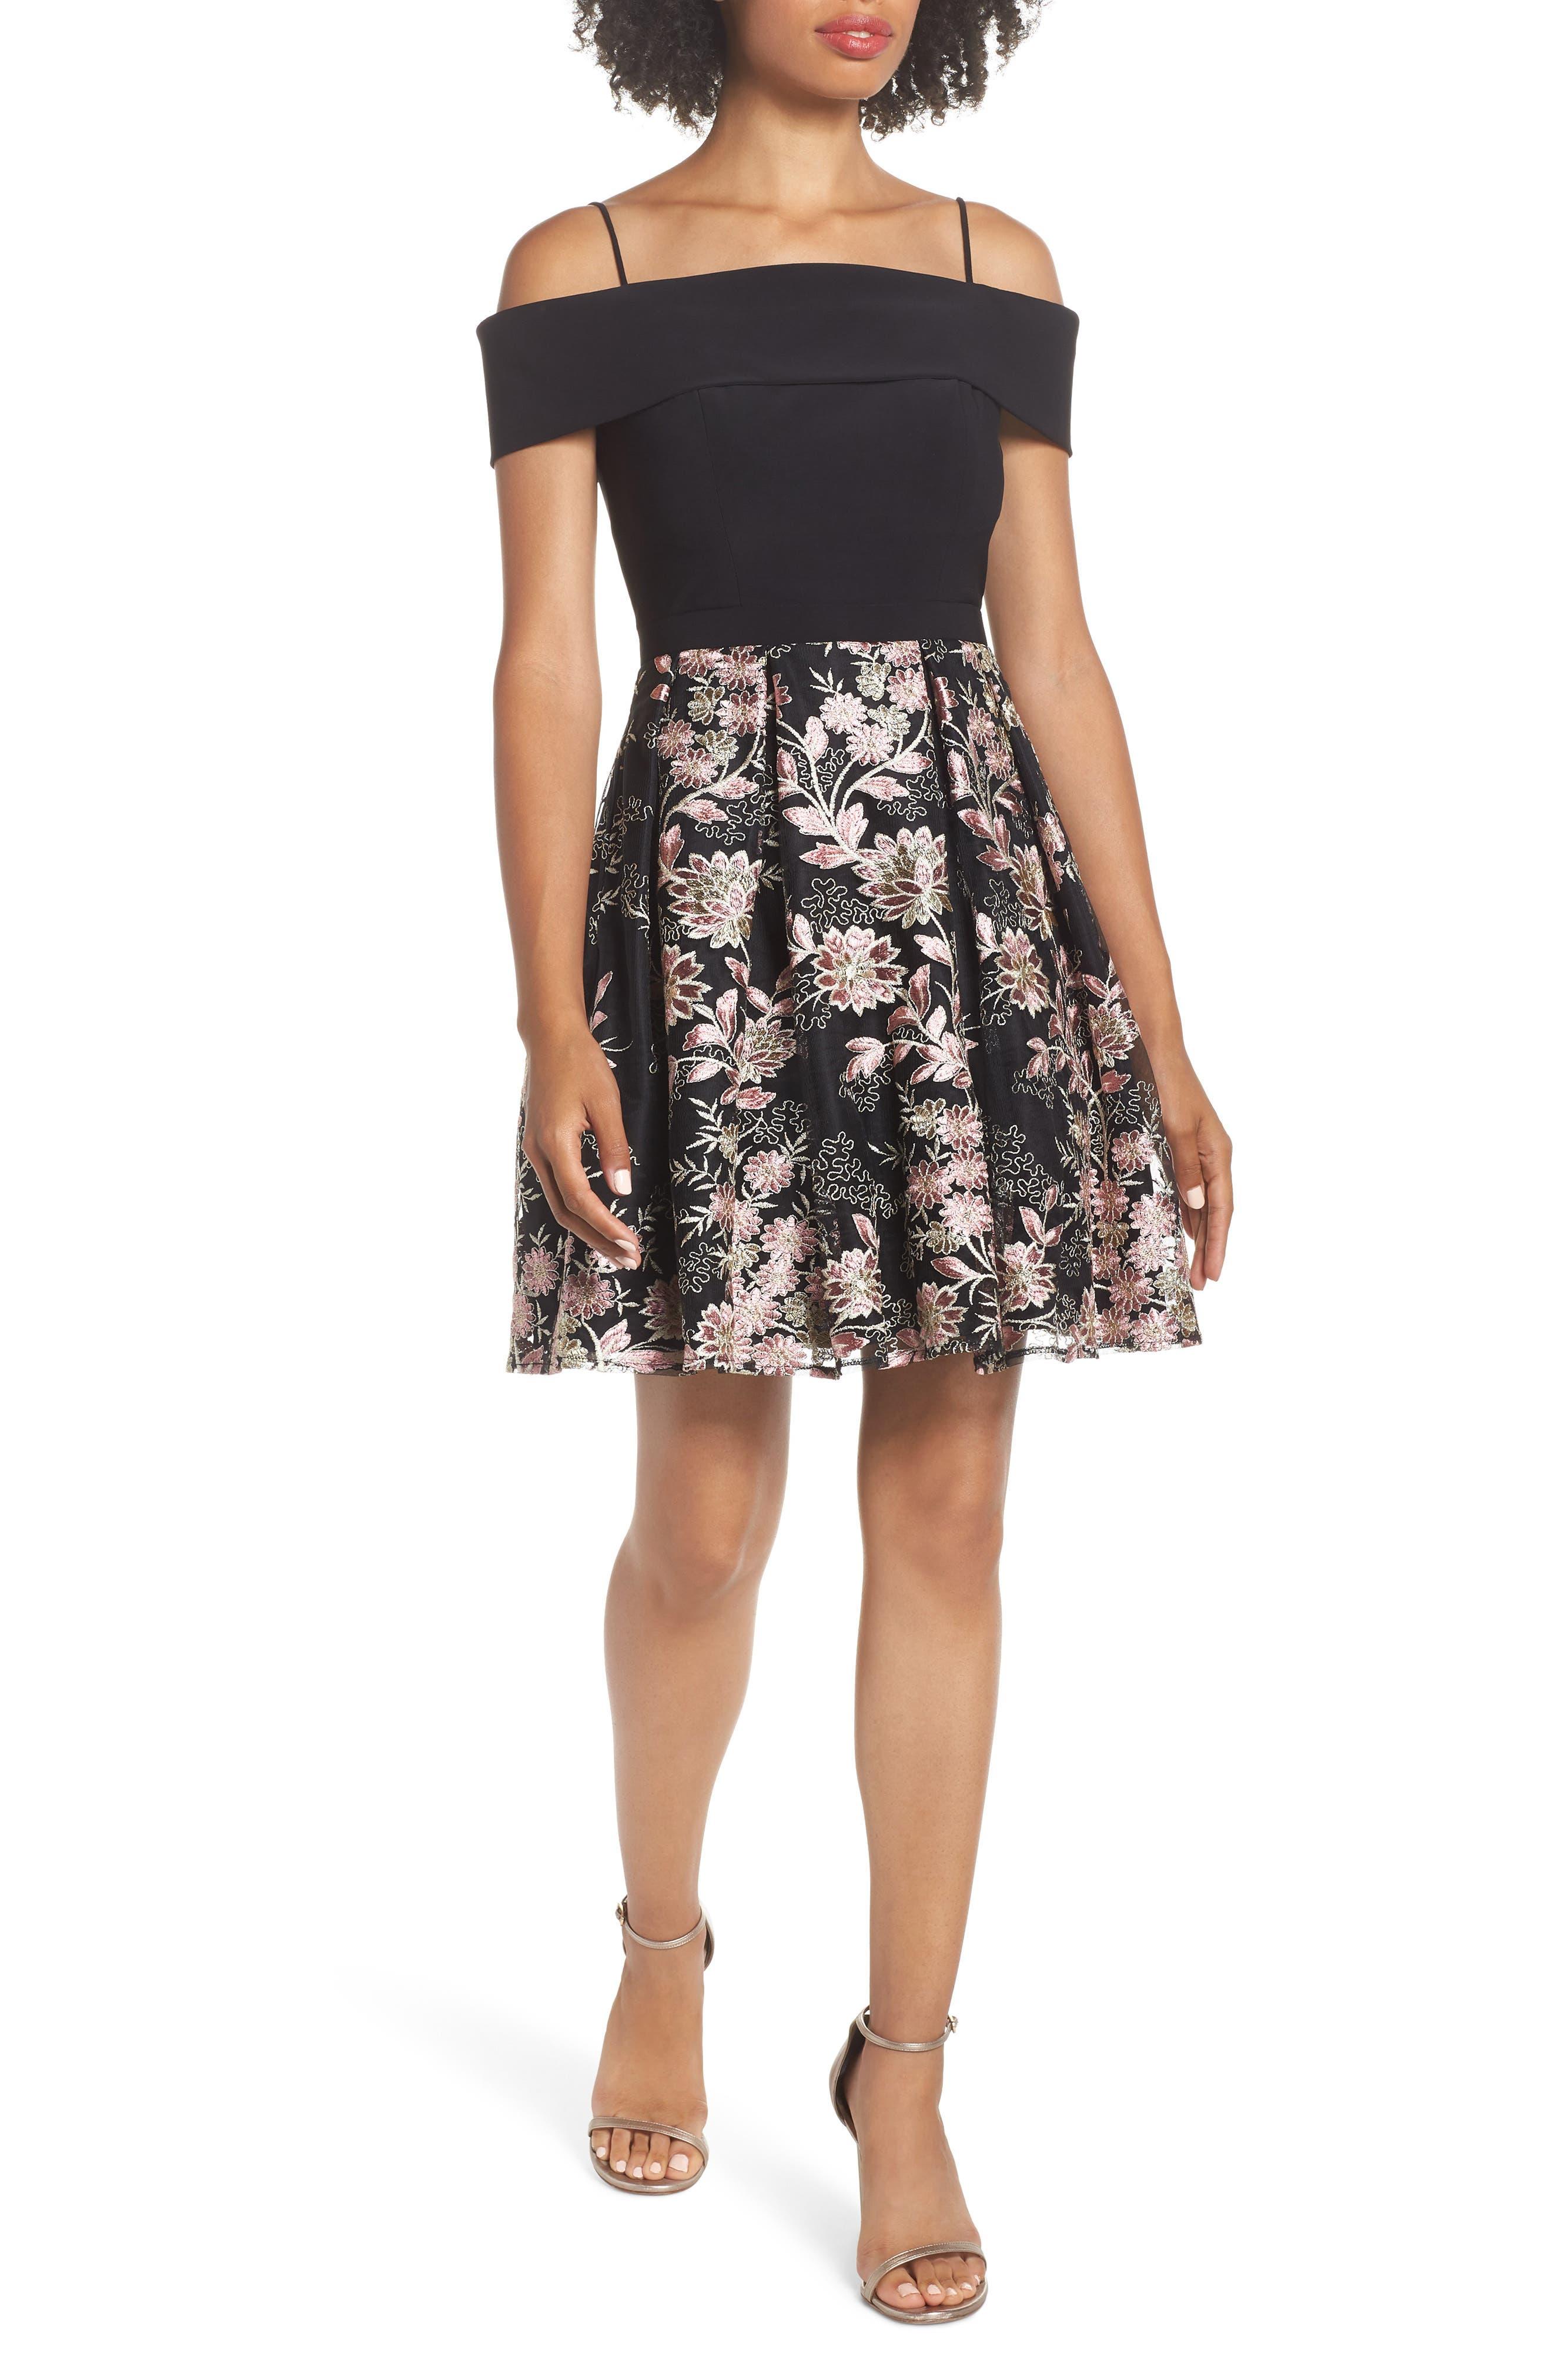 Morgan & Co. Foldover Neckline Party Dress, Black